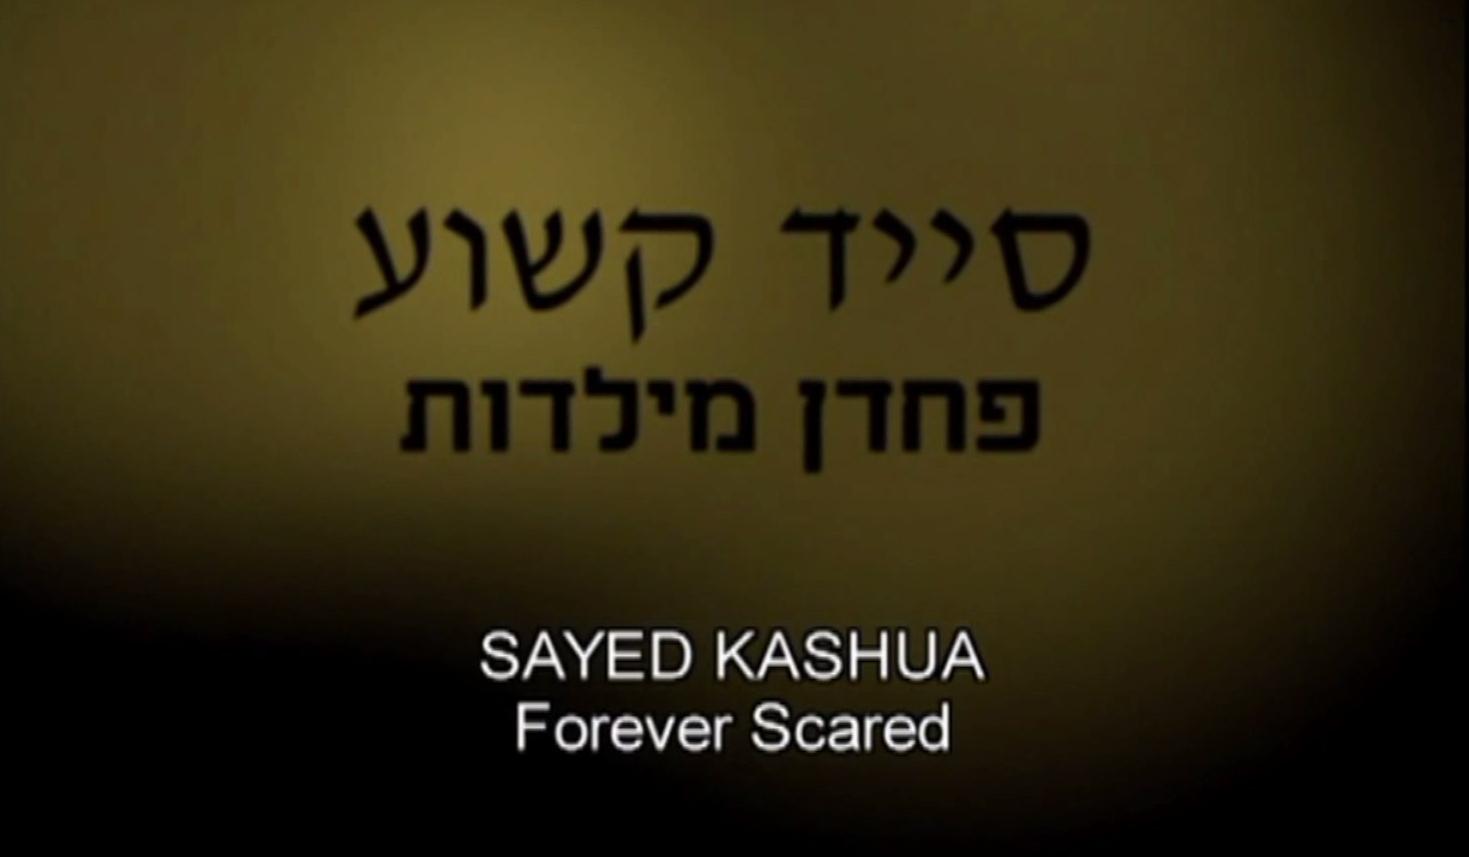 Forever Scared